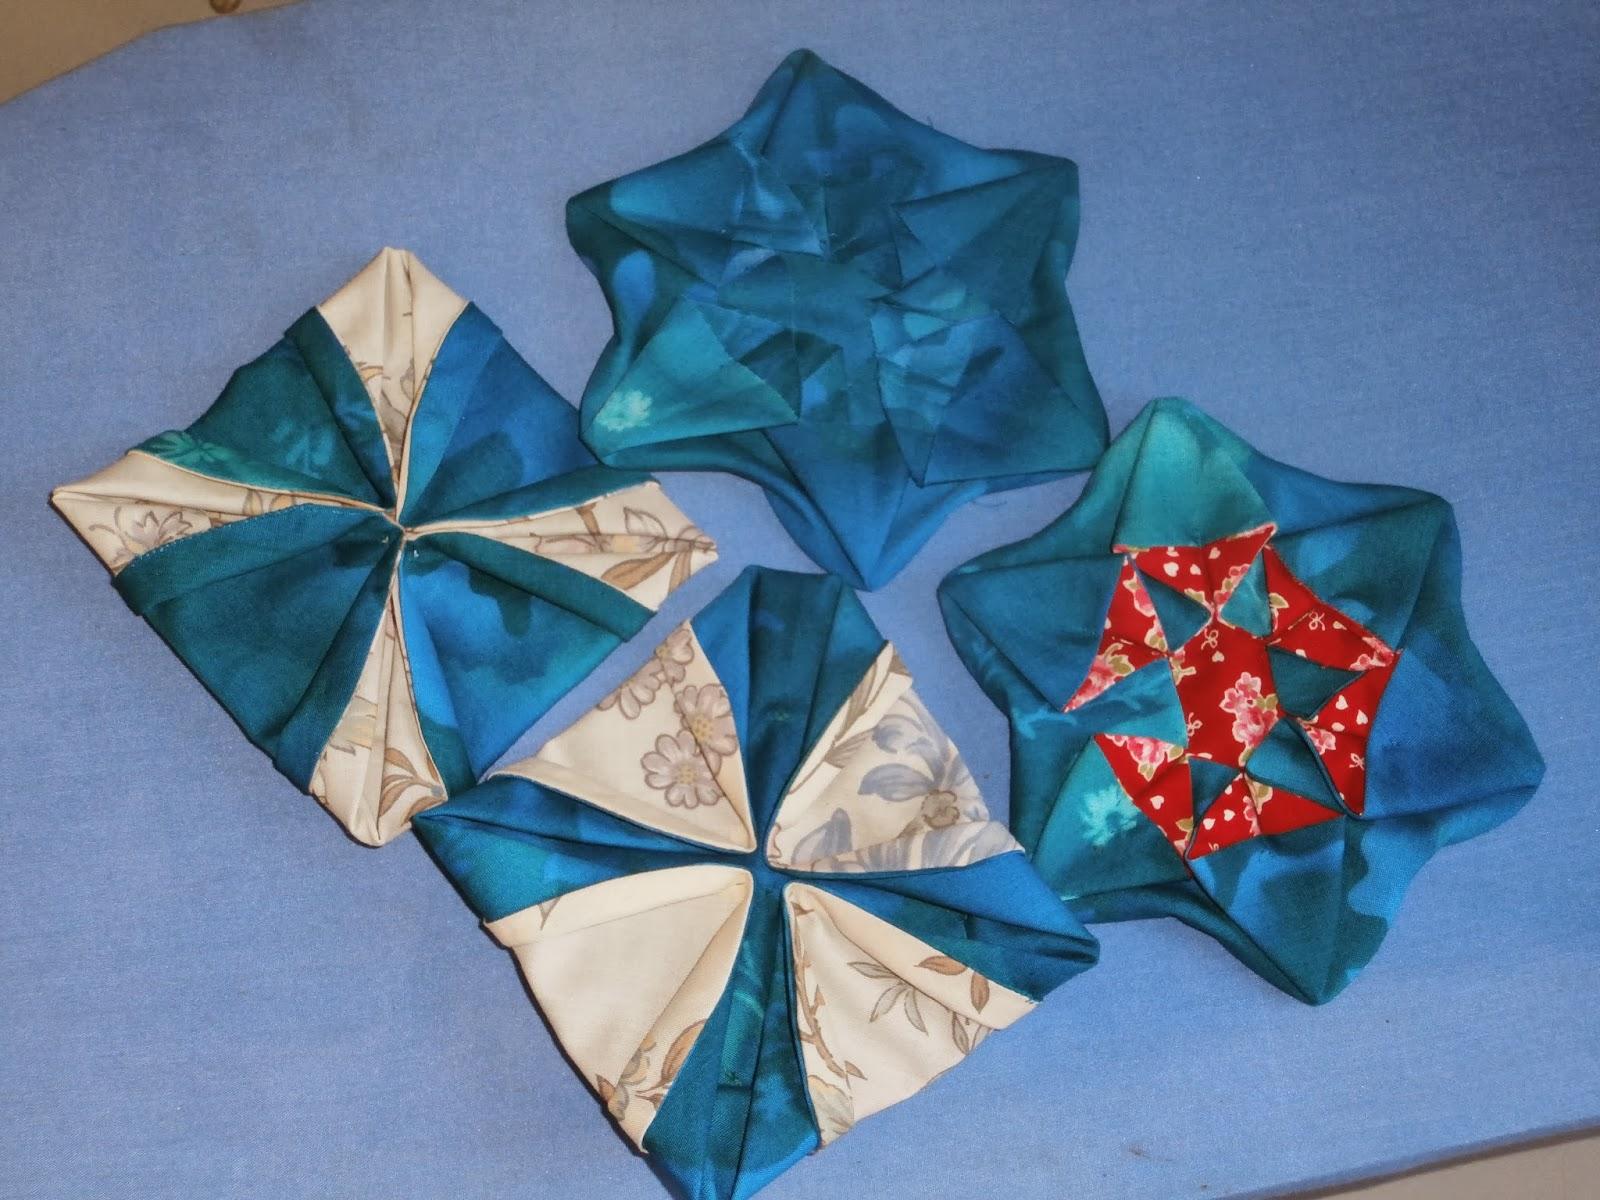 Lincoln stitchers origami fabric flowers with mary bull 18th jan 2014 origami fabric flowers with mary bull 18th jan 2014 mightylinksfo